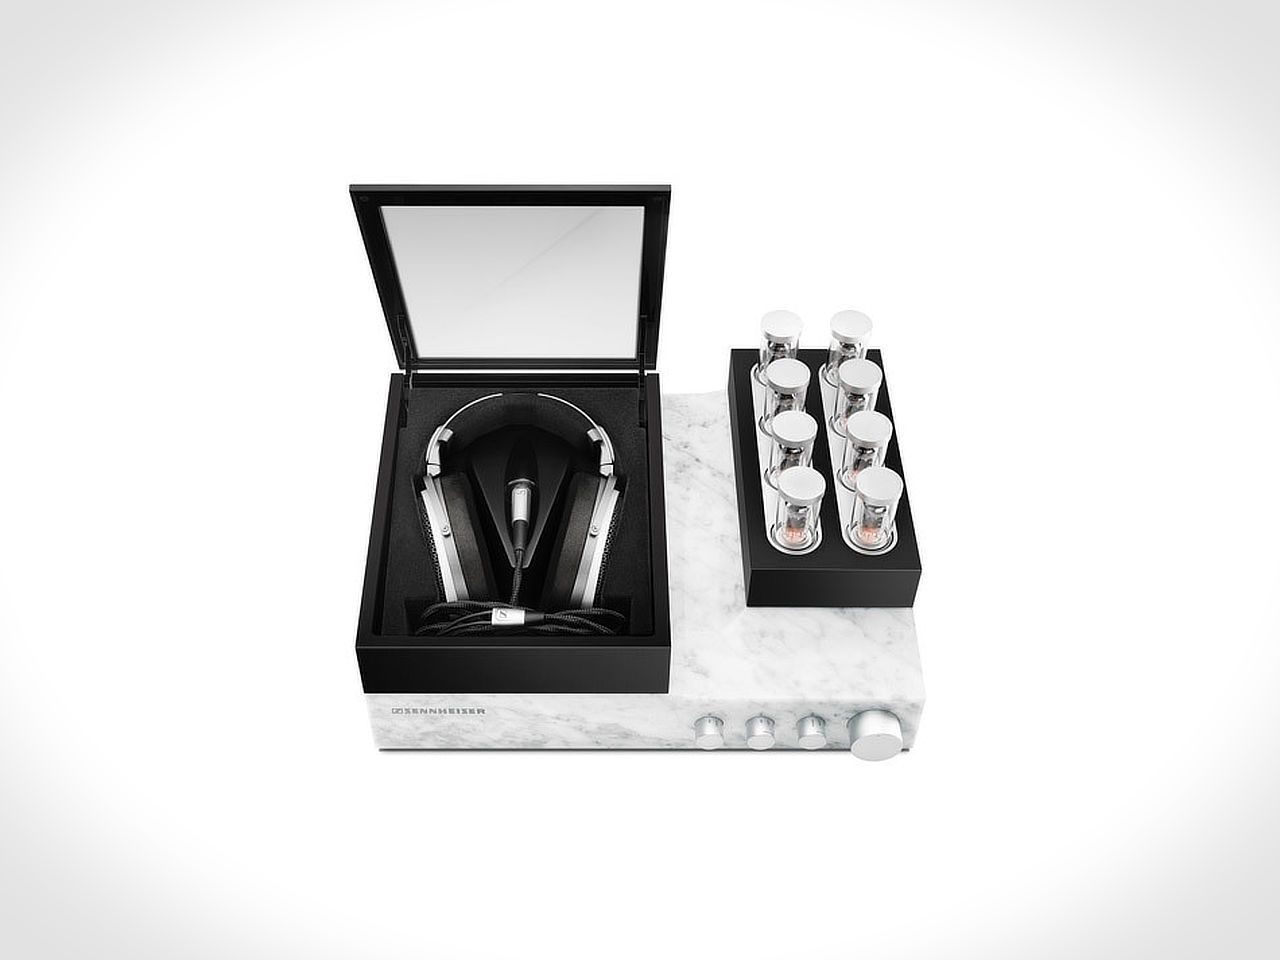 sennheiser-se-1-headphones-001